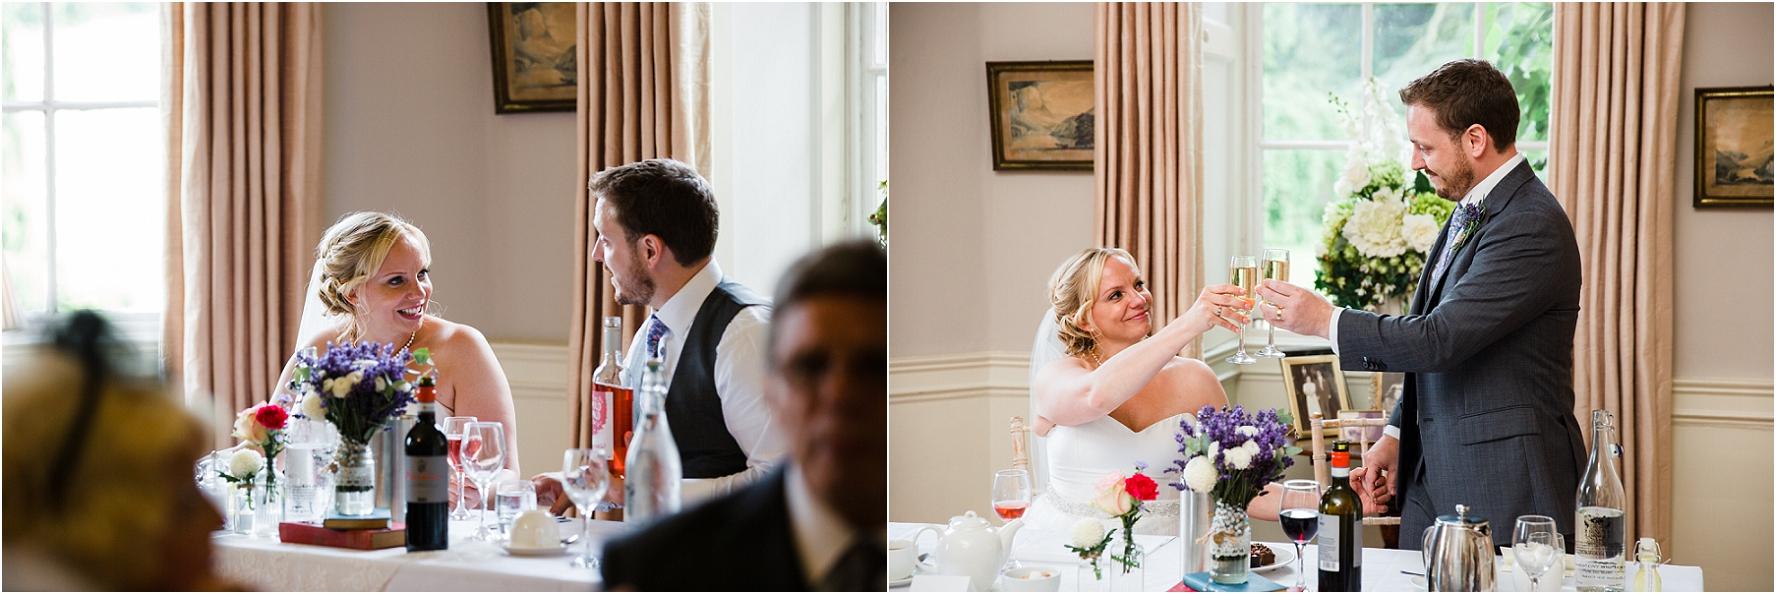 wedding-photography-the-orangery-settringham_0498